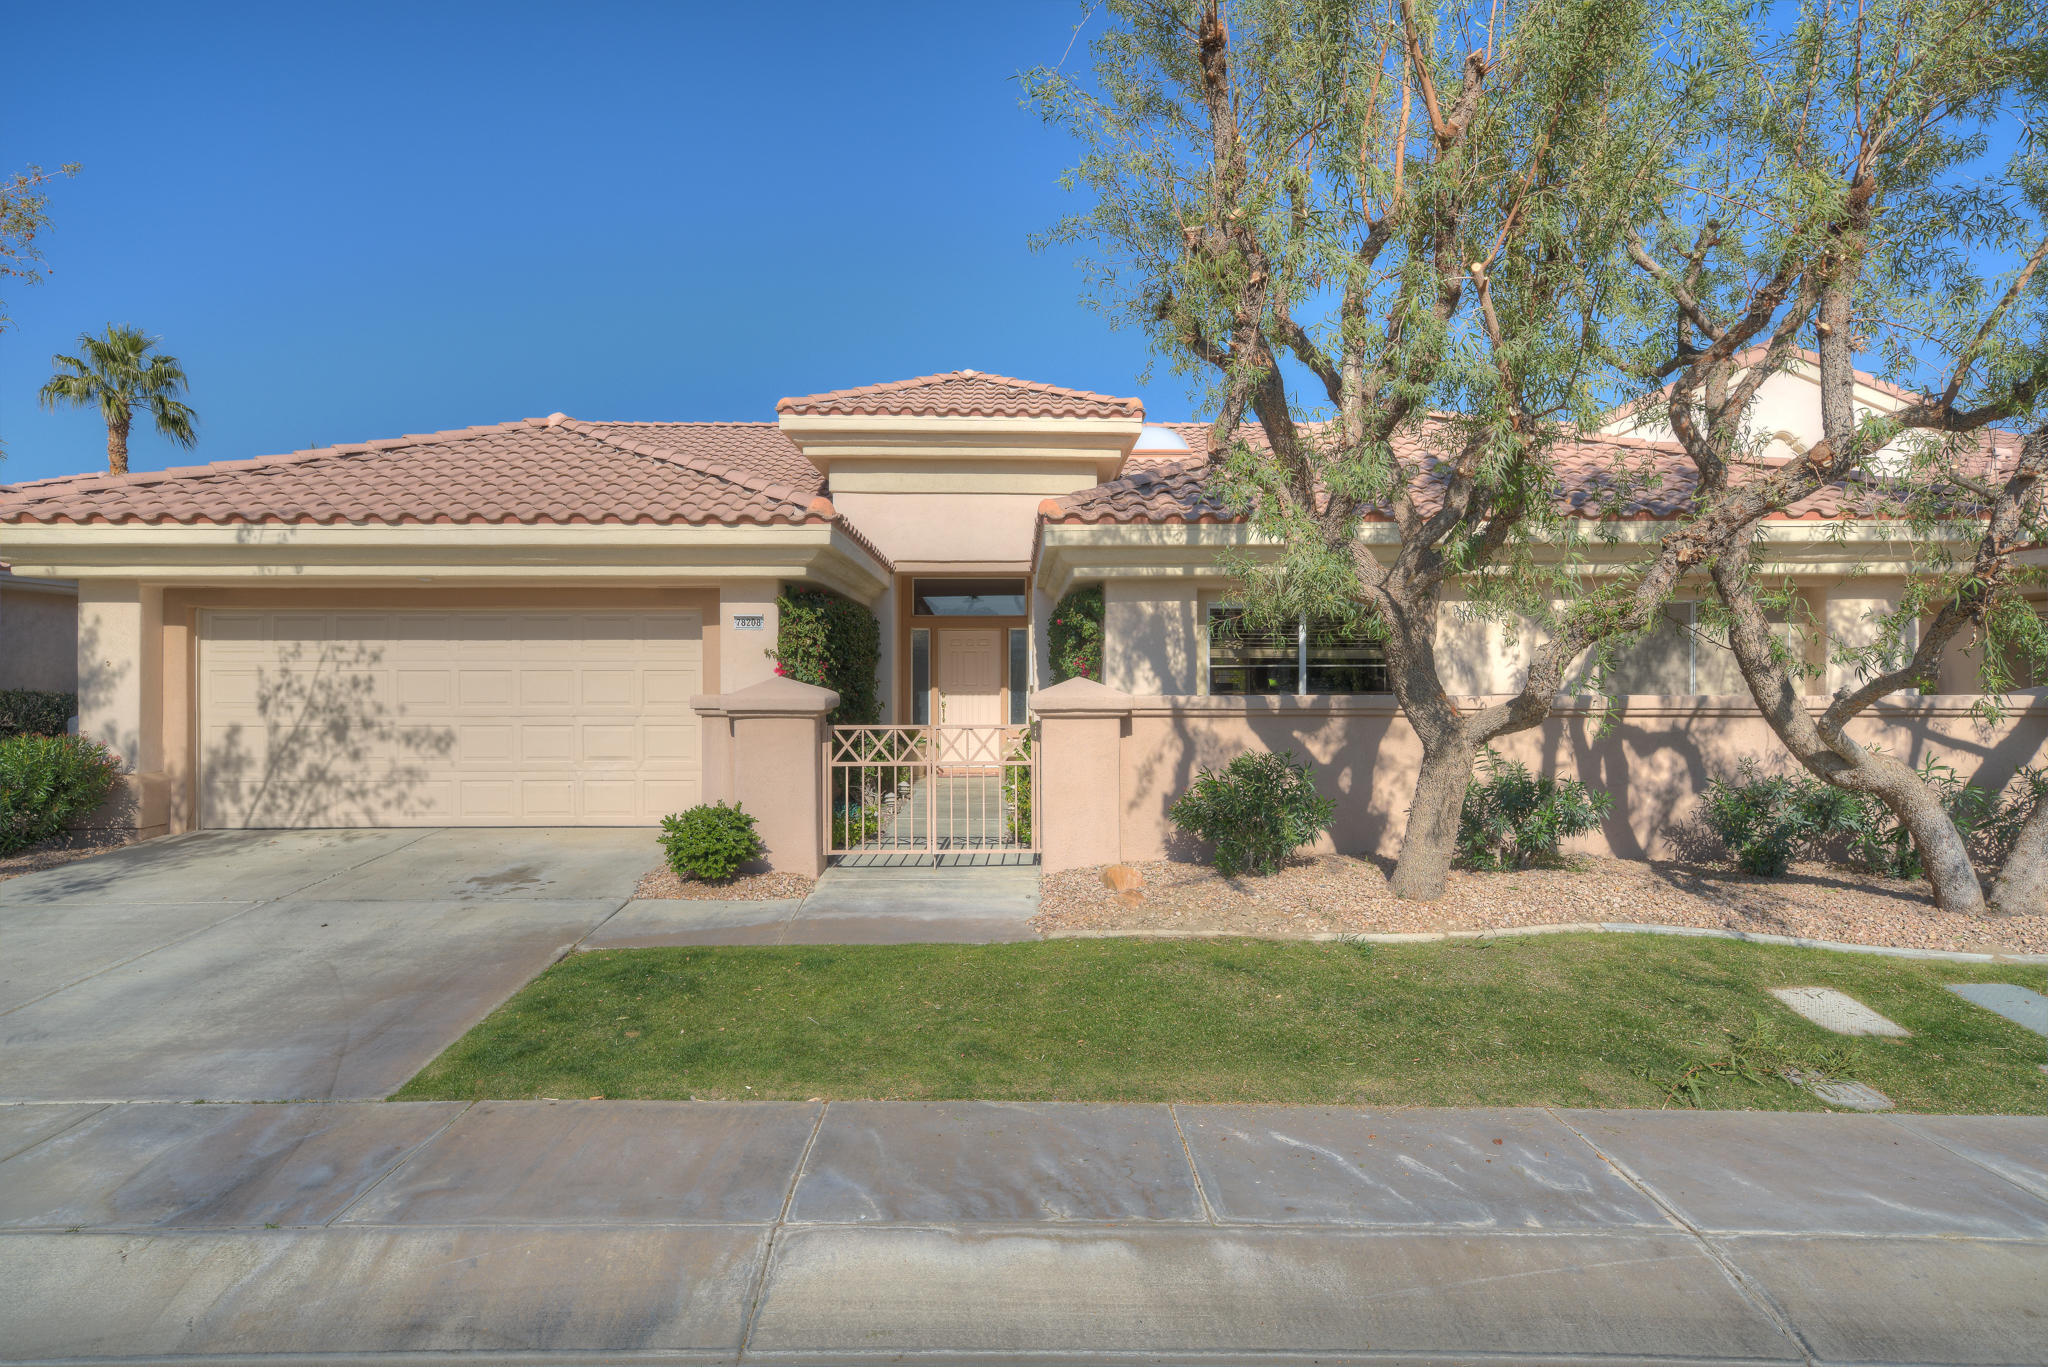 Photo of 78208 Desert Willow Drive, Palm Desert, CA 92211